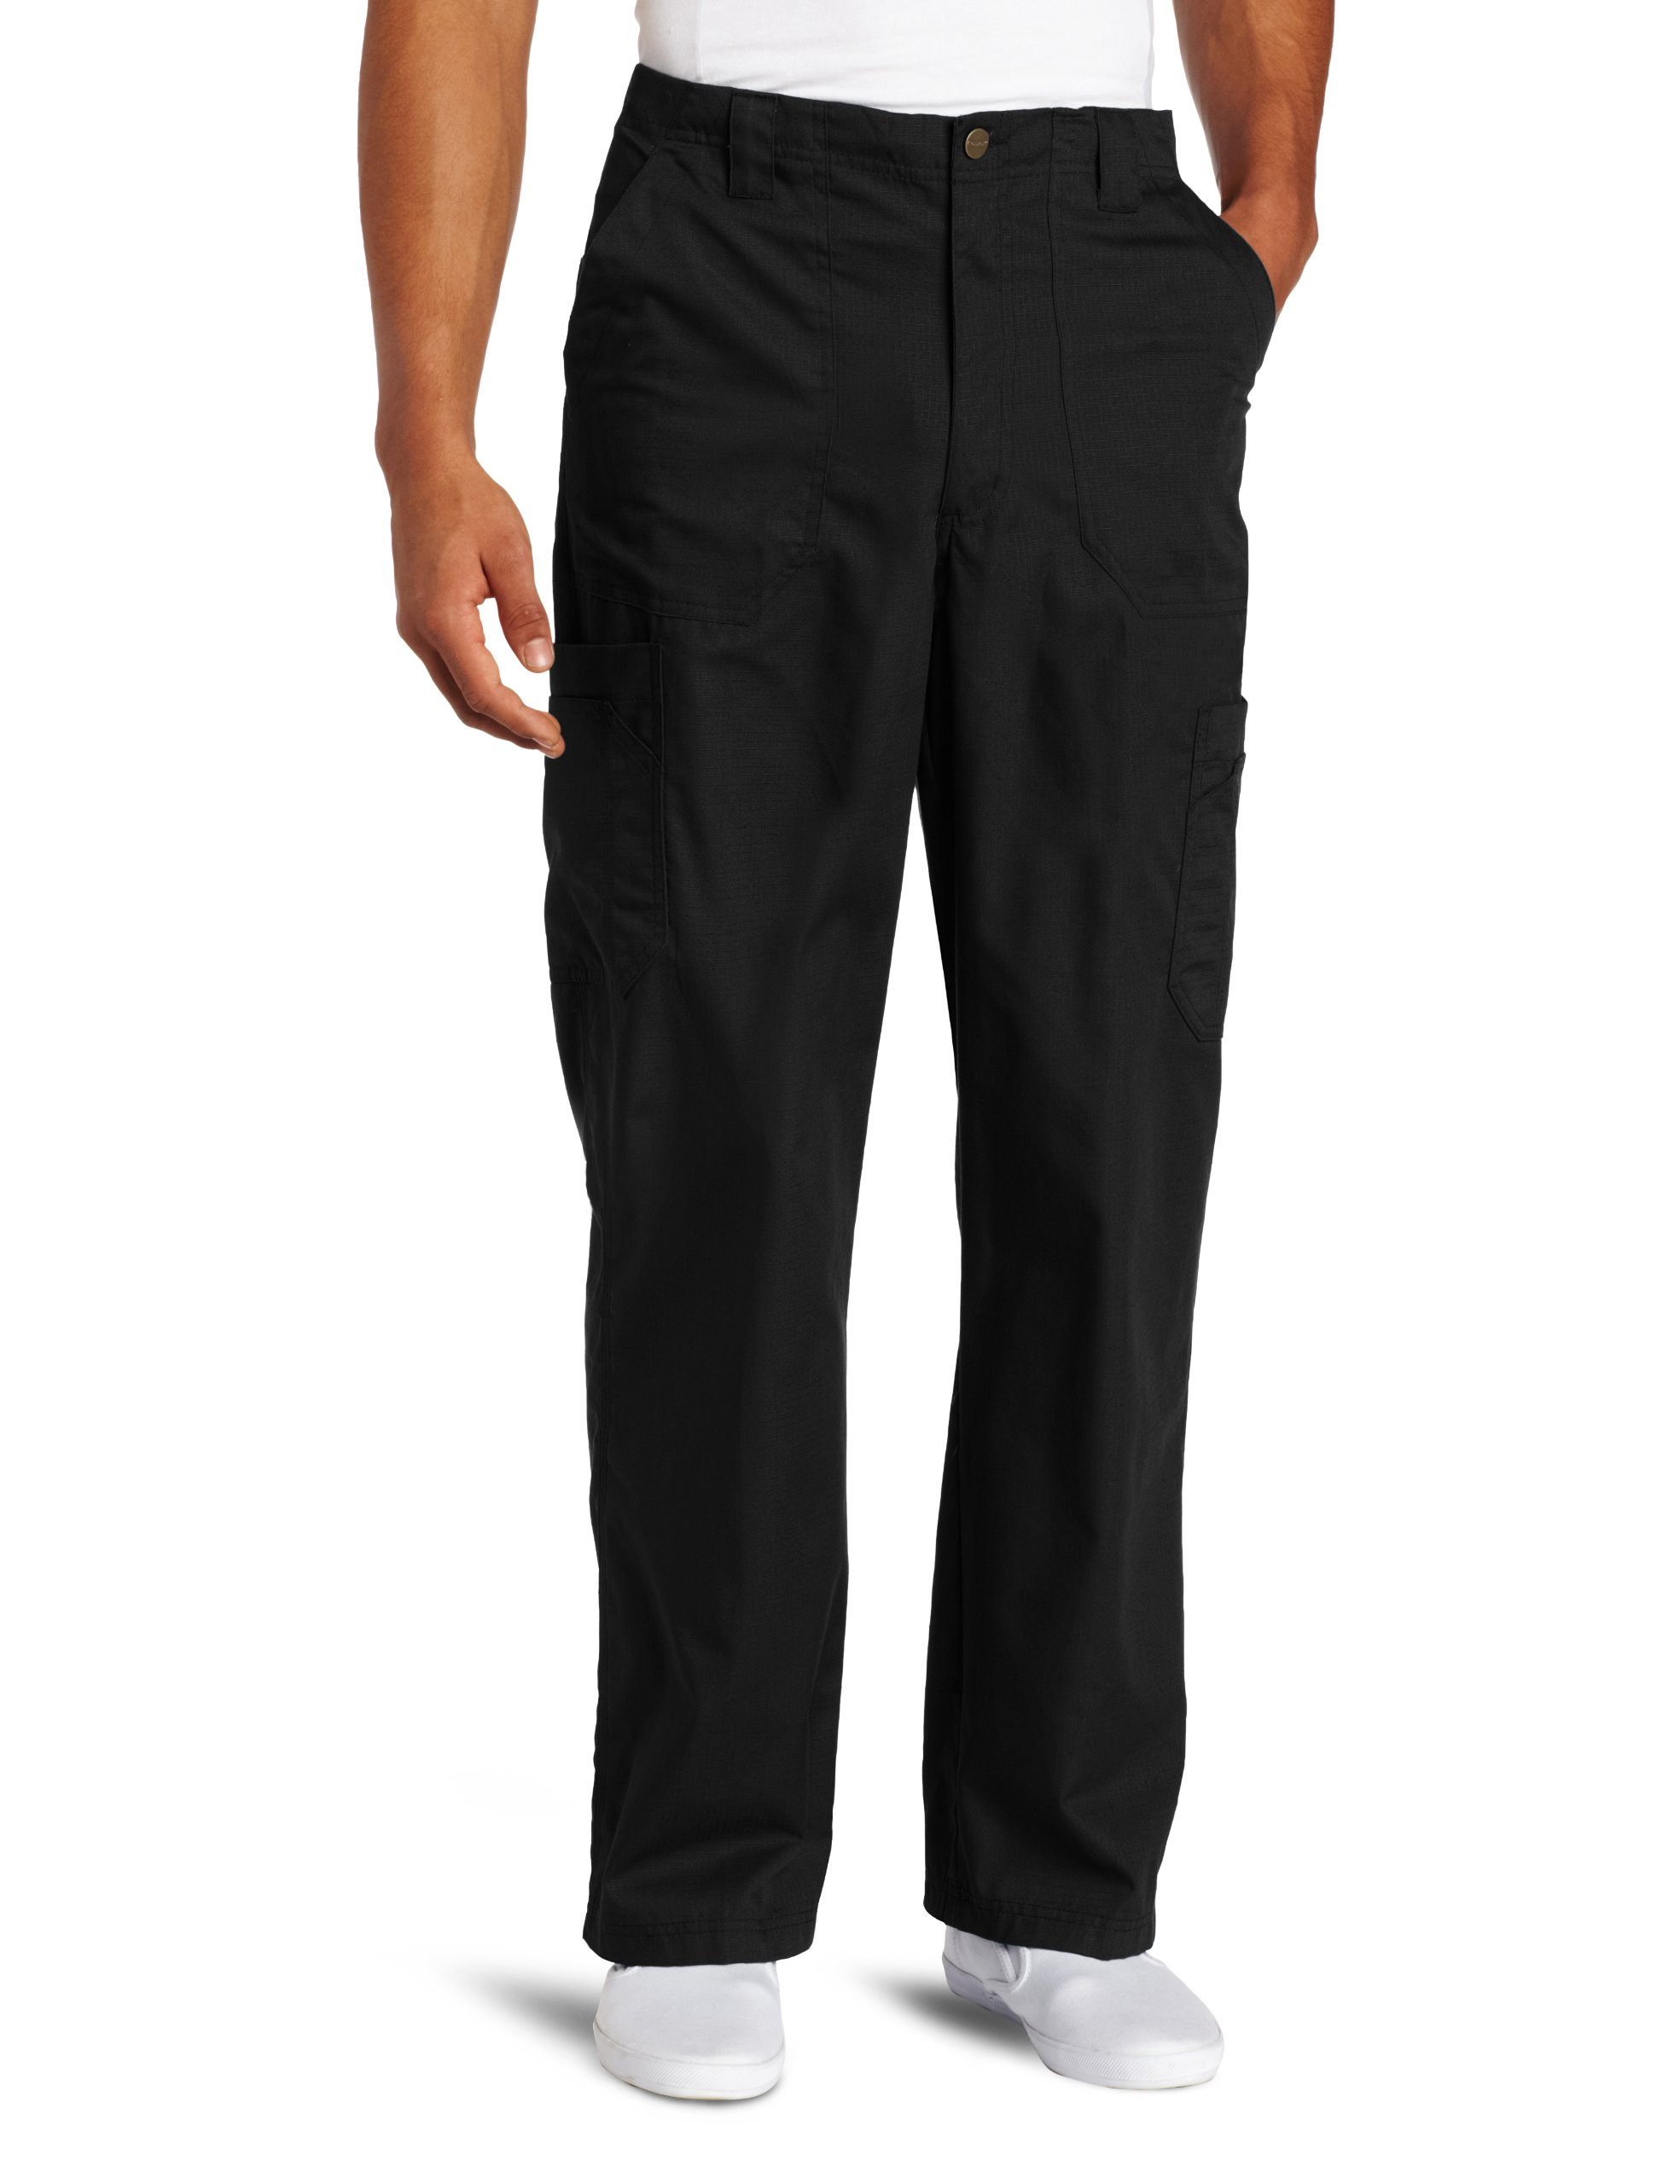 Carhartt Men's Ripstop Multi-Cargo Scrub Pant, Black, X-Large